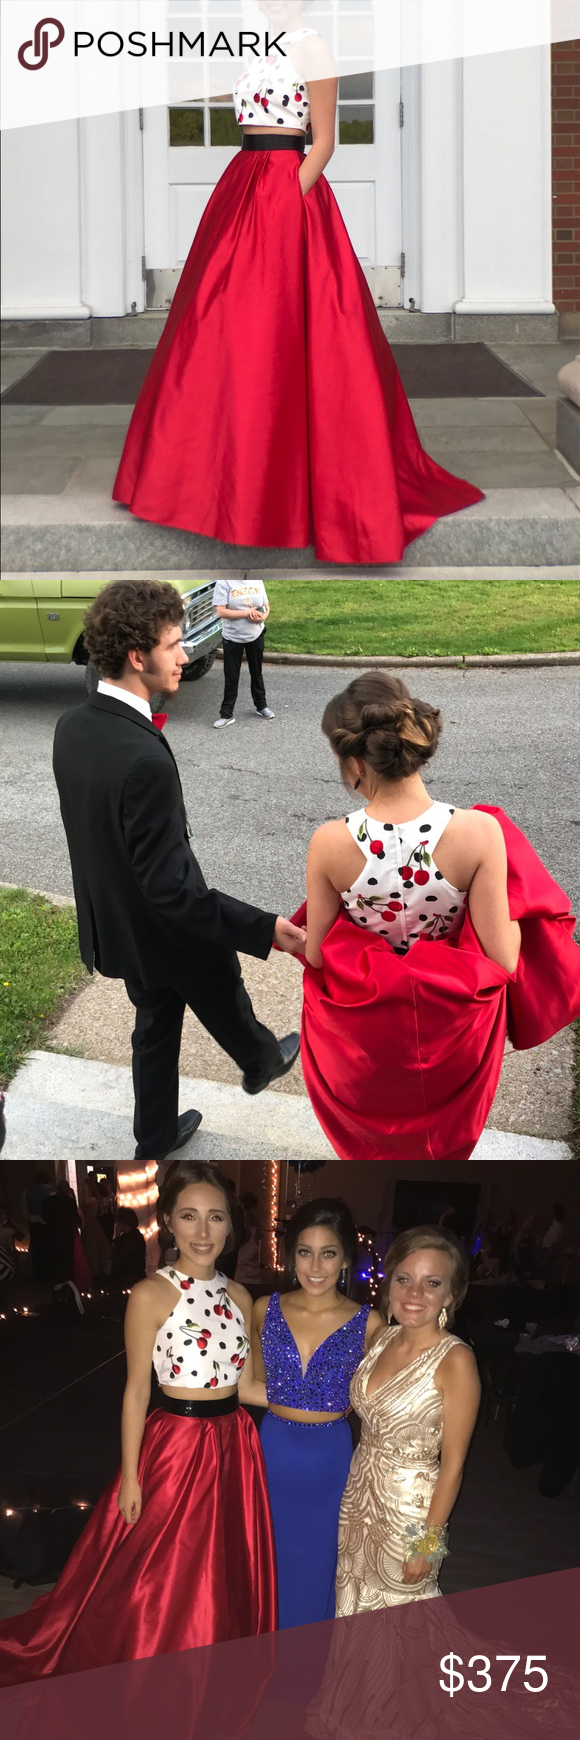 Sherri hill cherry prom dress cherries dress prom and prom